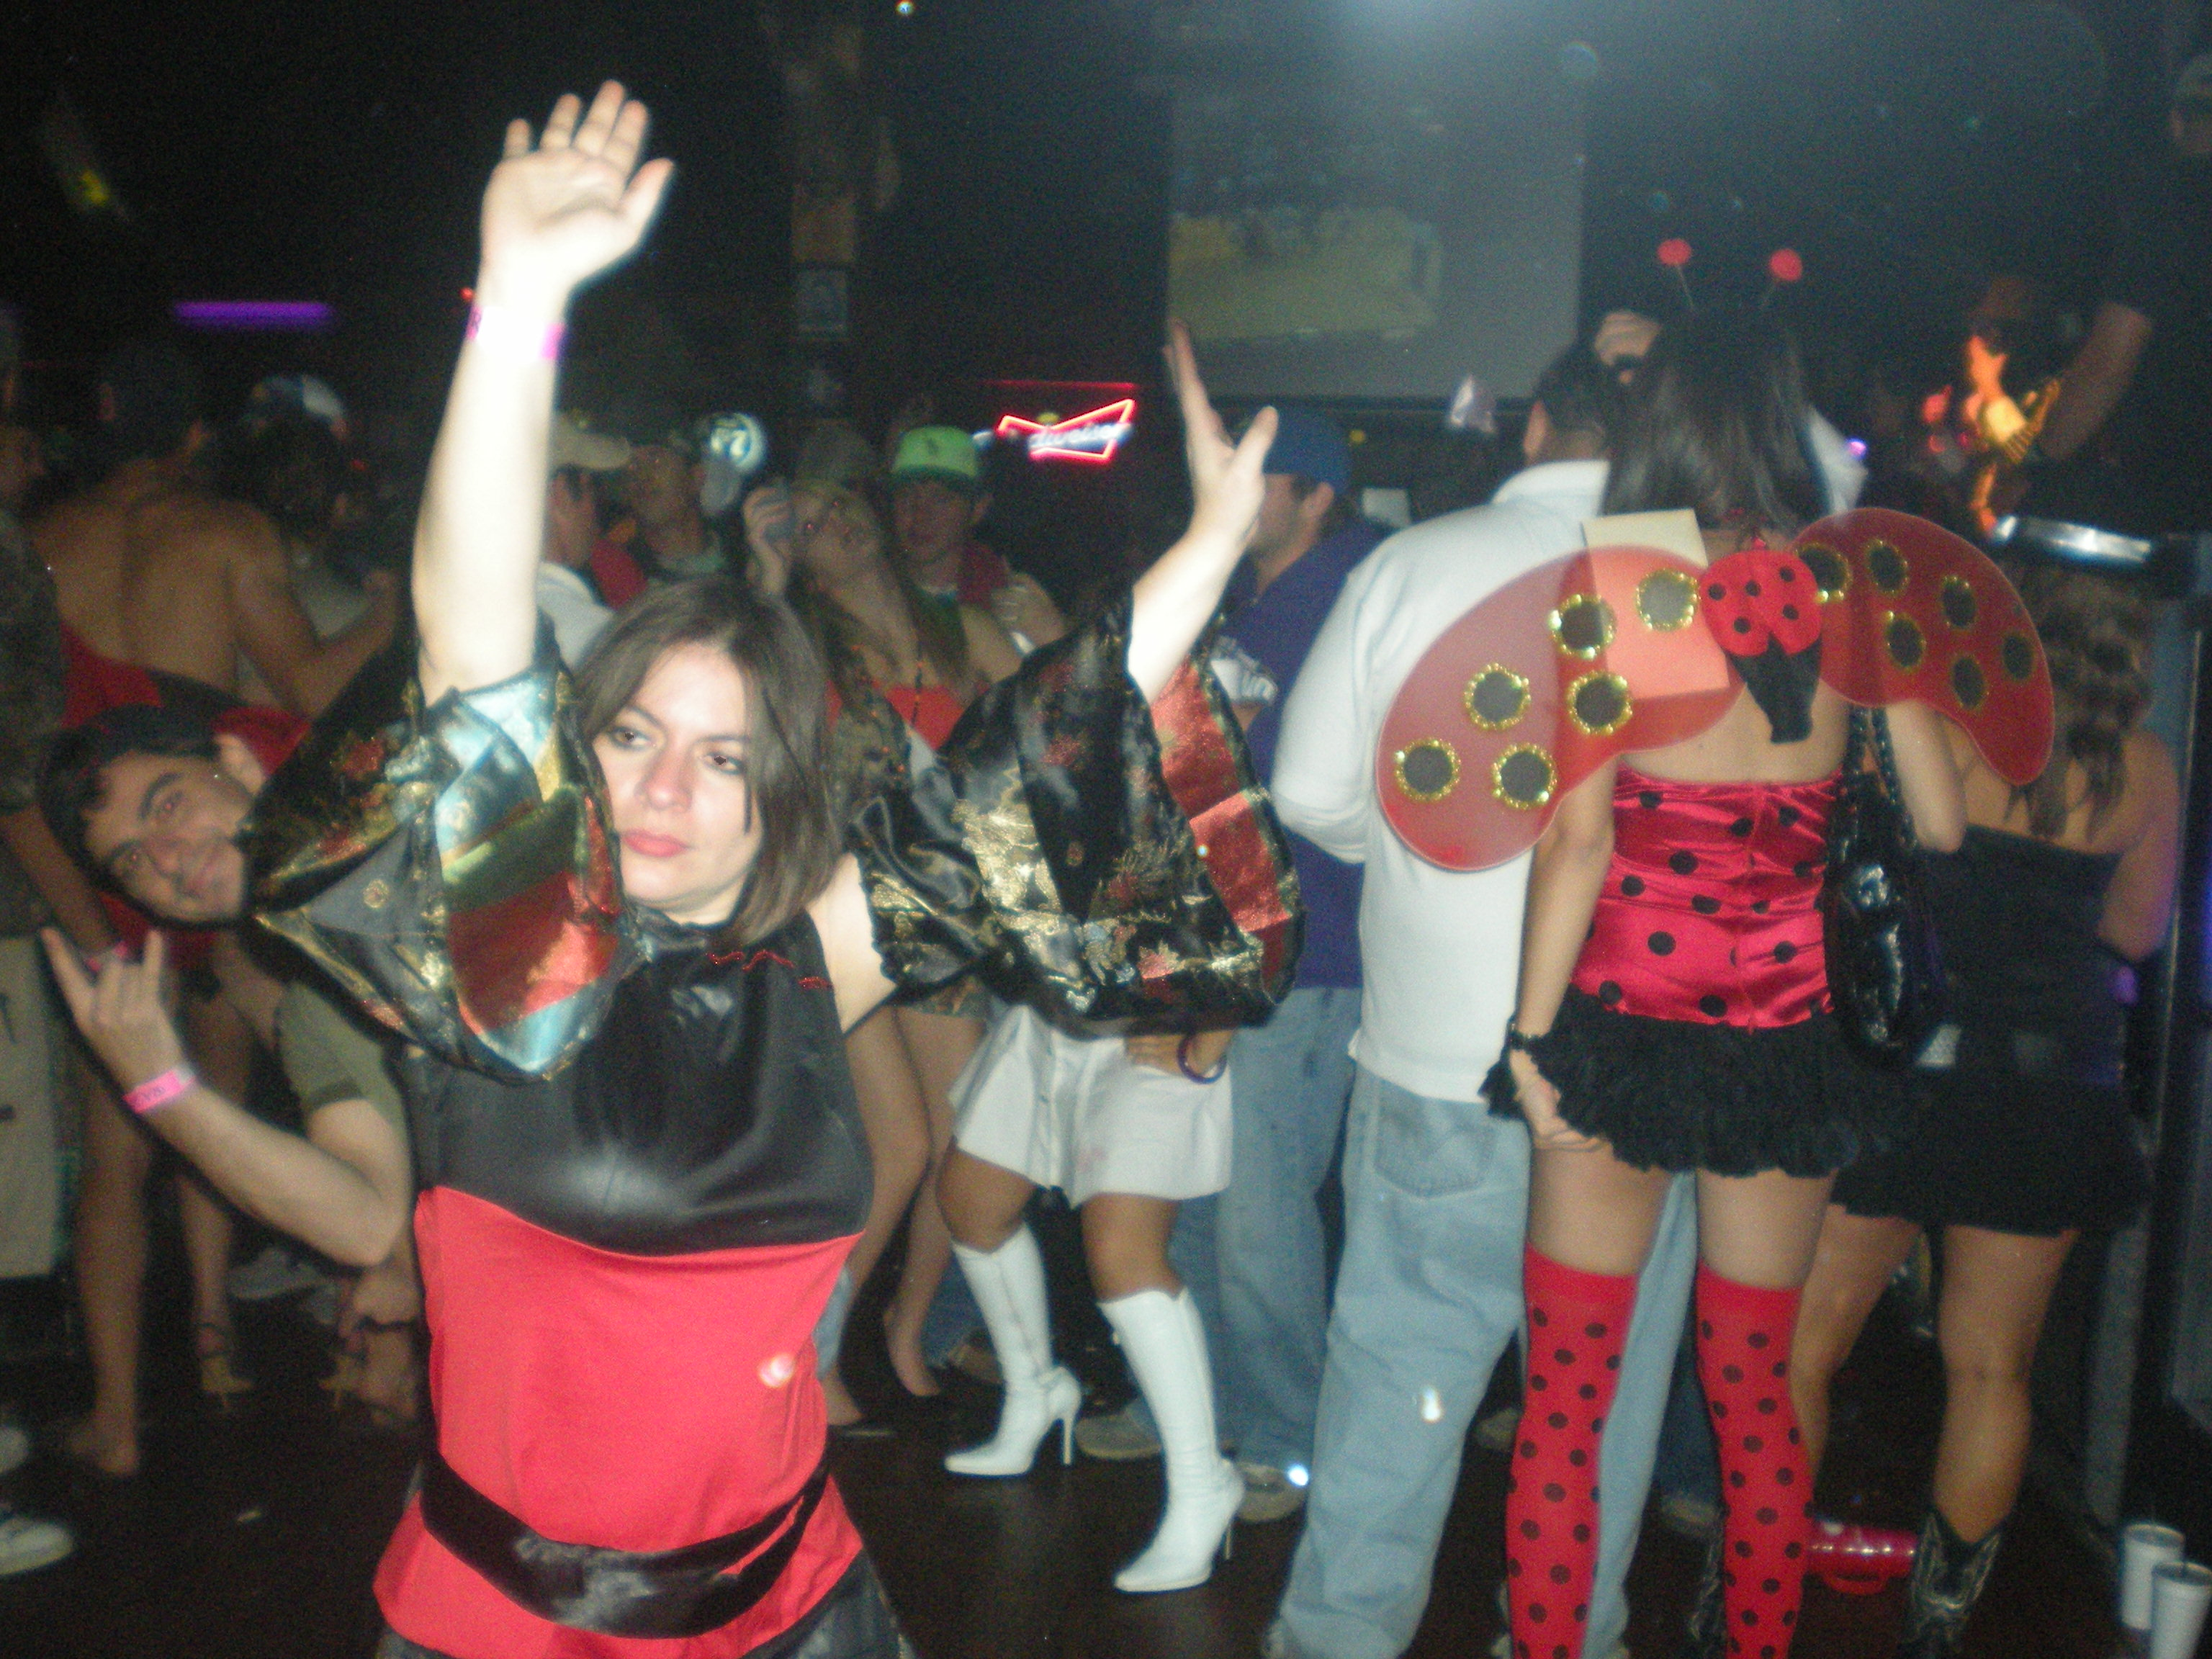 EJs, swingers Parties - Swinging in Melbourne Australia